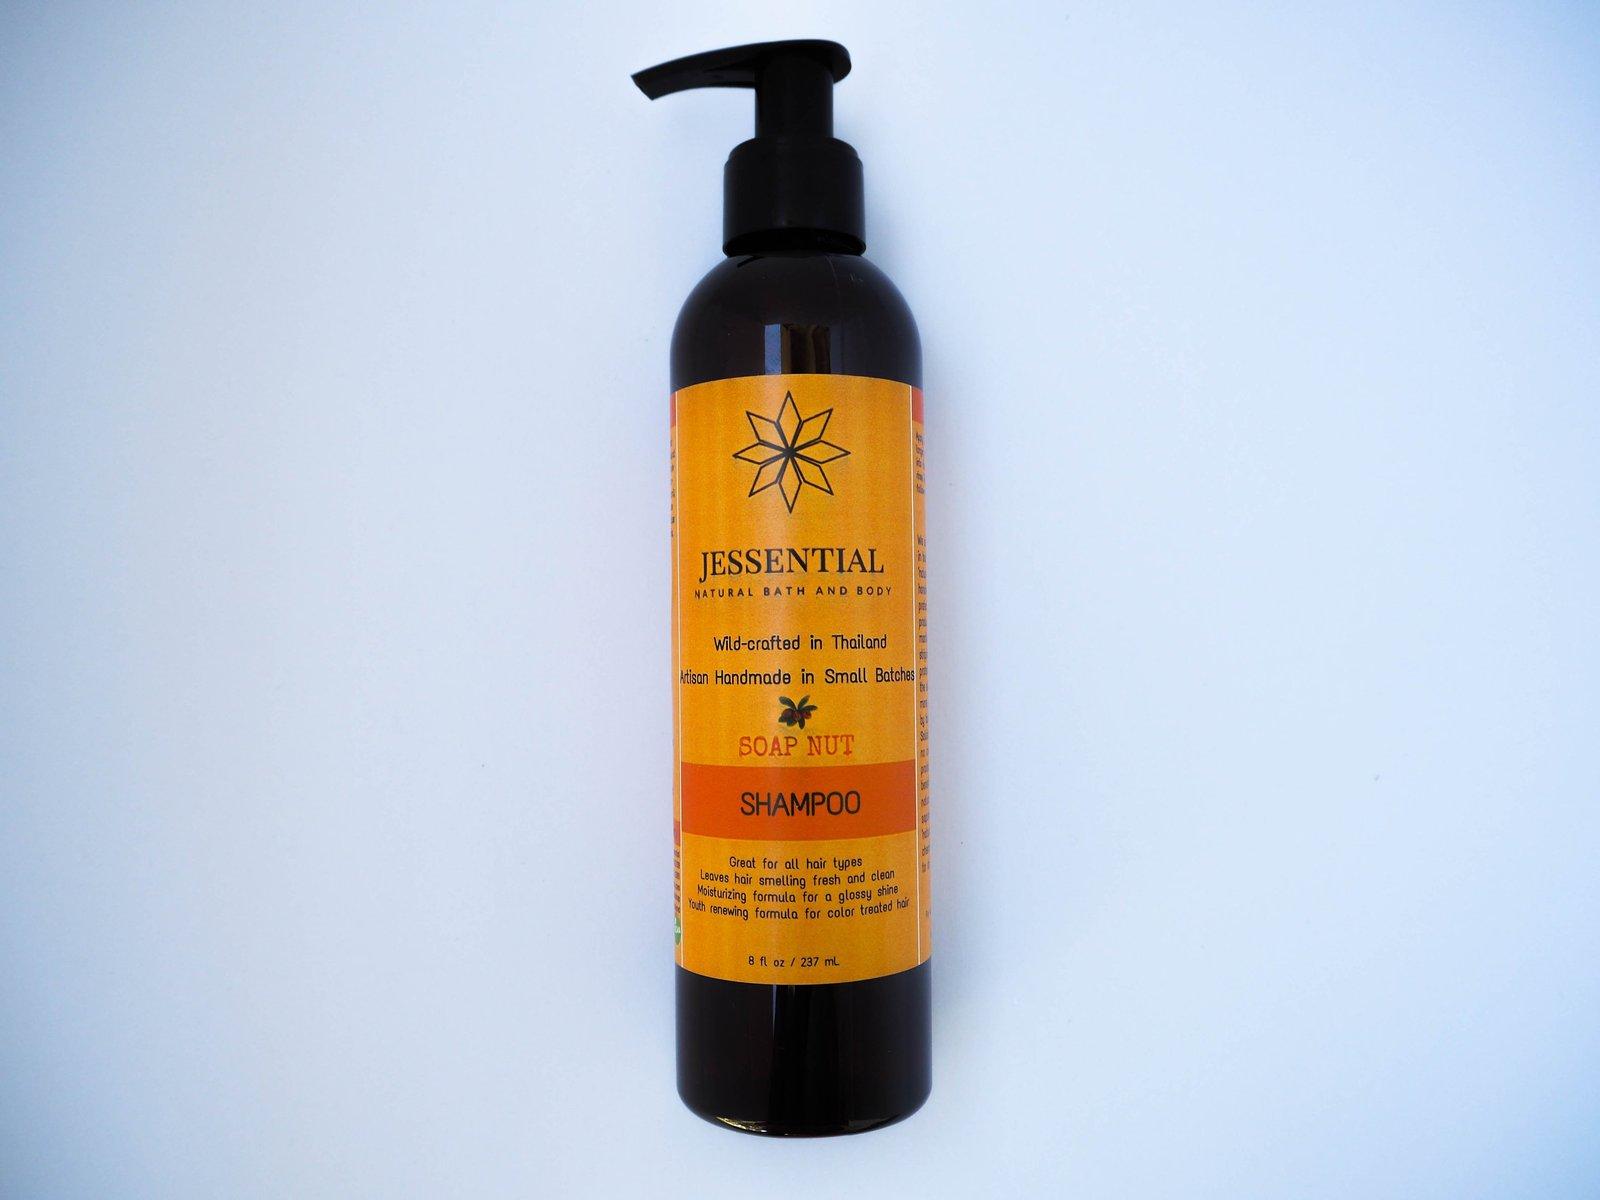 8oz 3 set Shampoo, Body Wash, Conditioner Vegan for eczema, dry skin, dandruff